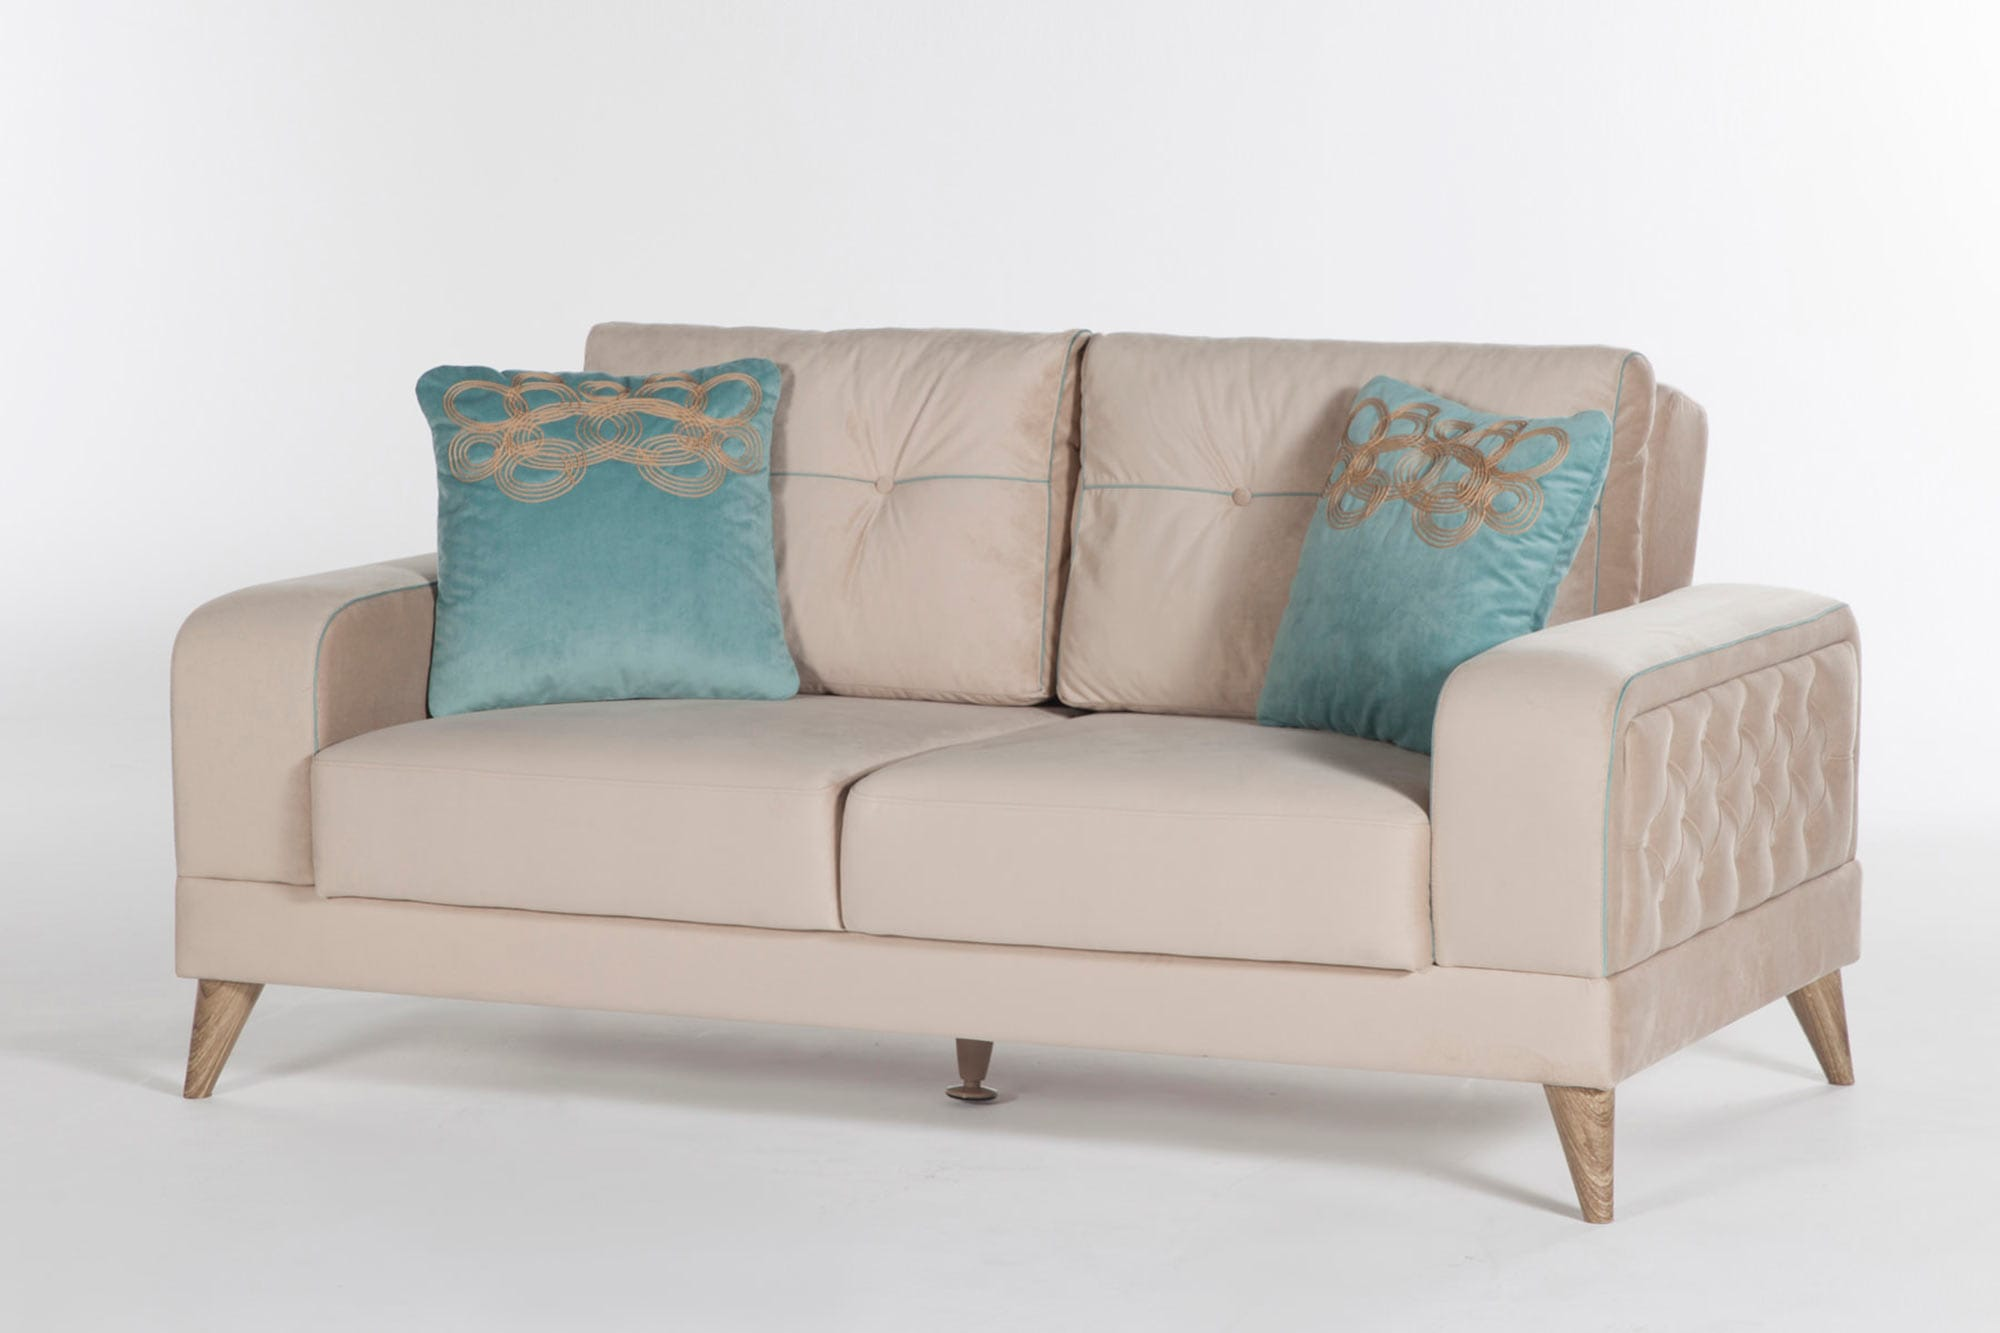 Vienza Lilyum Cream Sofa Love Amp Chair Set By Sunset